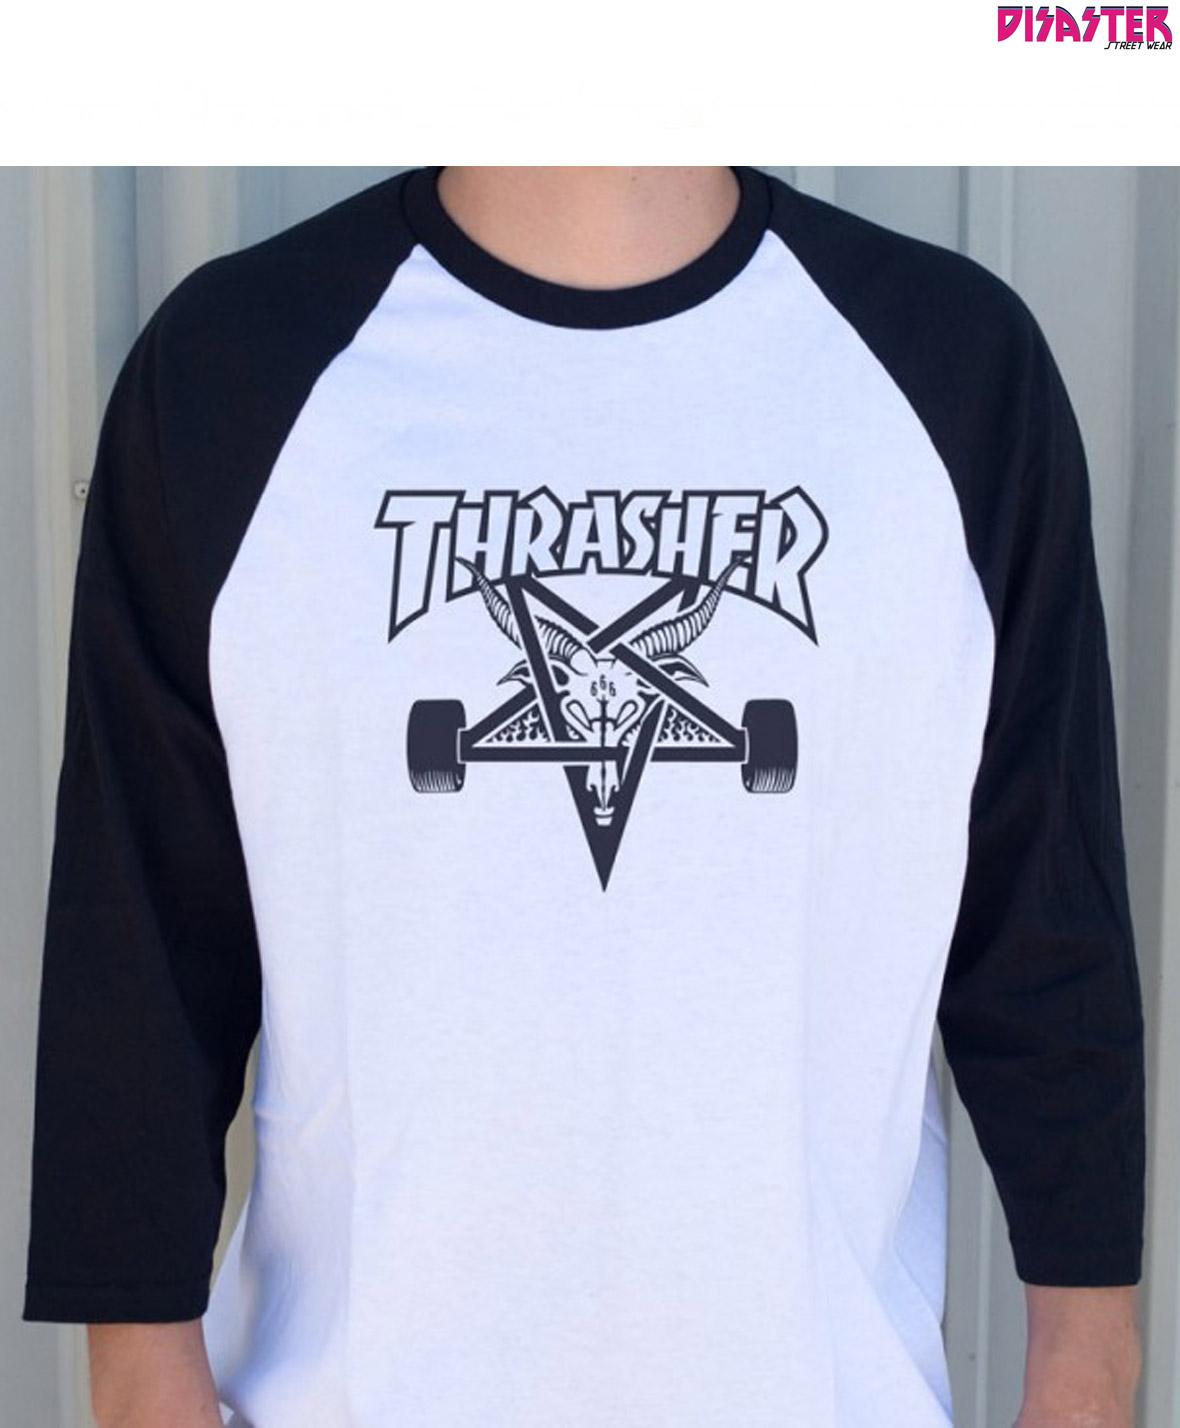 3b95481c7 camiseta-raglan-thrasher-skate-and-destroy-negra-malaga-disaster ...